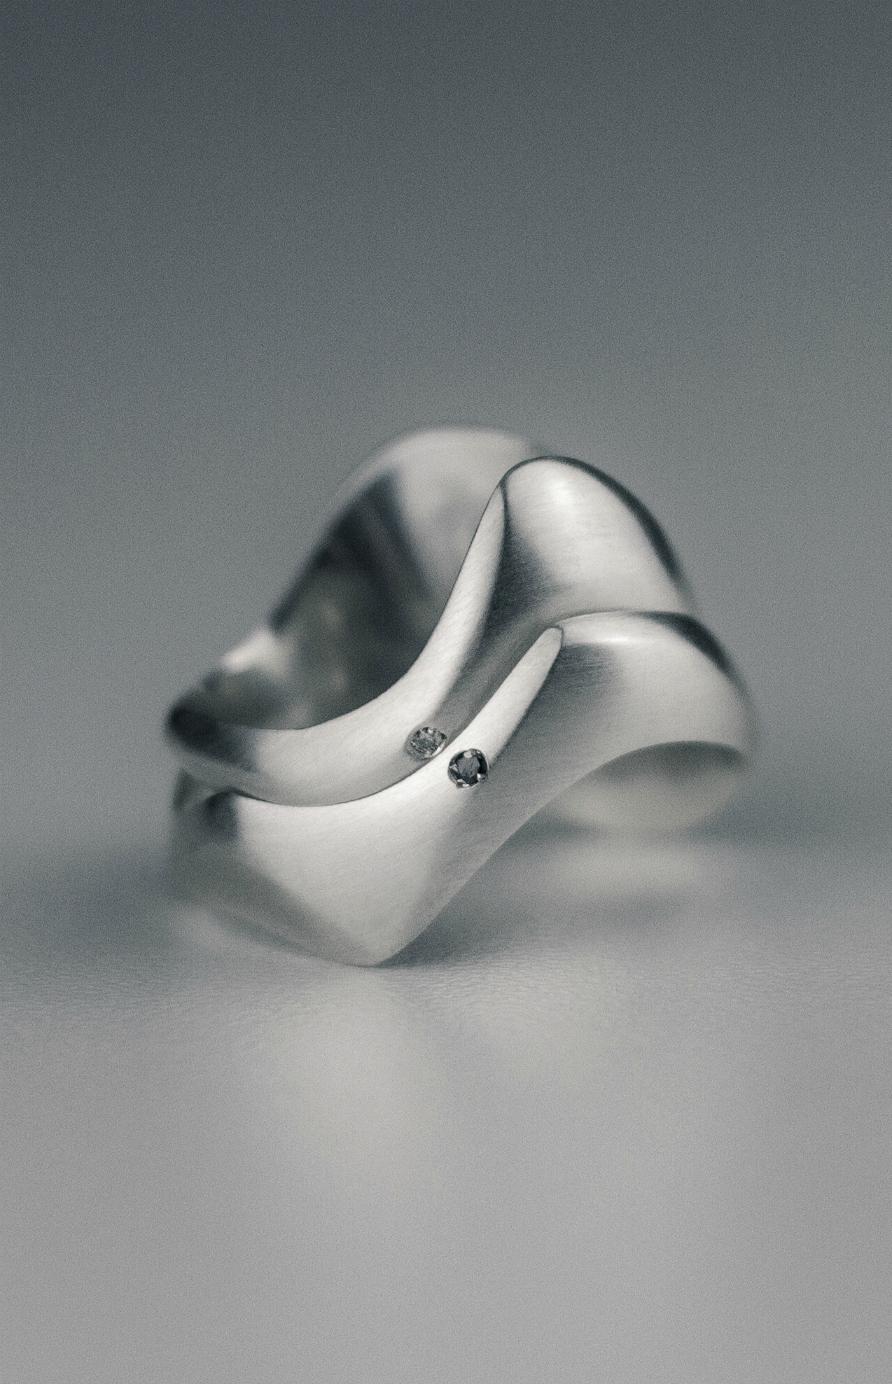 Joia Emocional Slow Aliança de Compromisso Prata Diamante Exclusiva Personalizada Lyz Beltrame